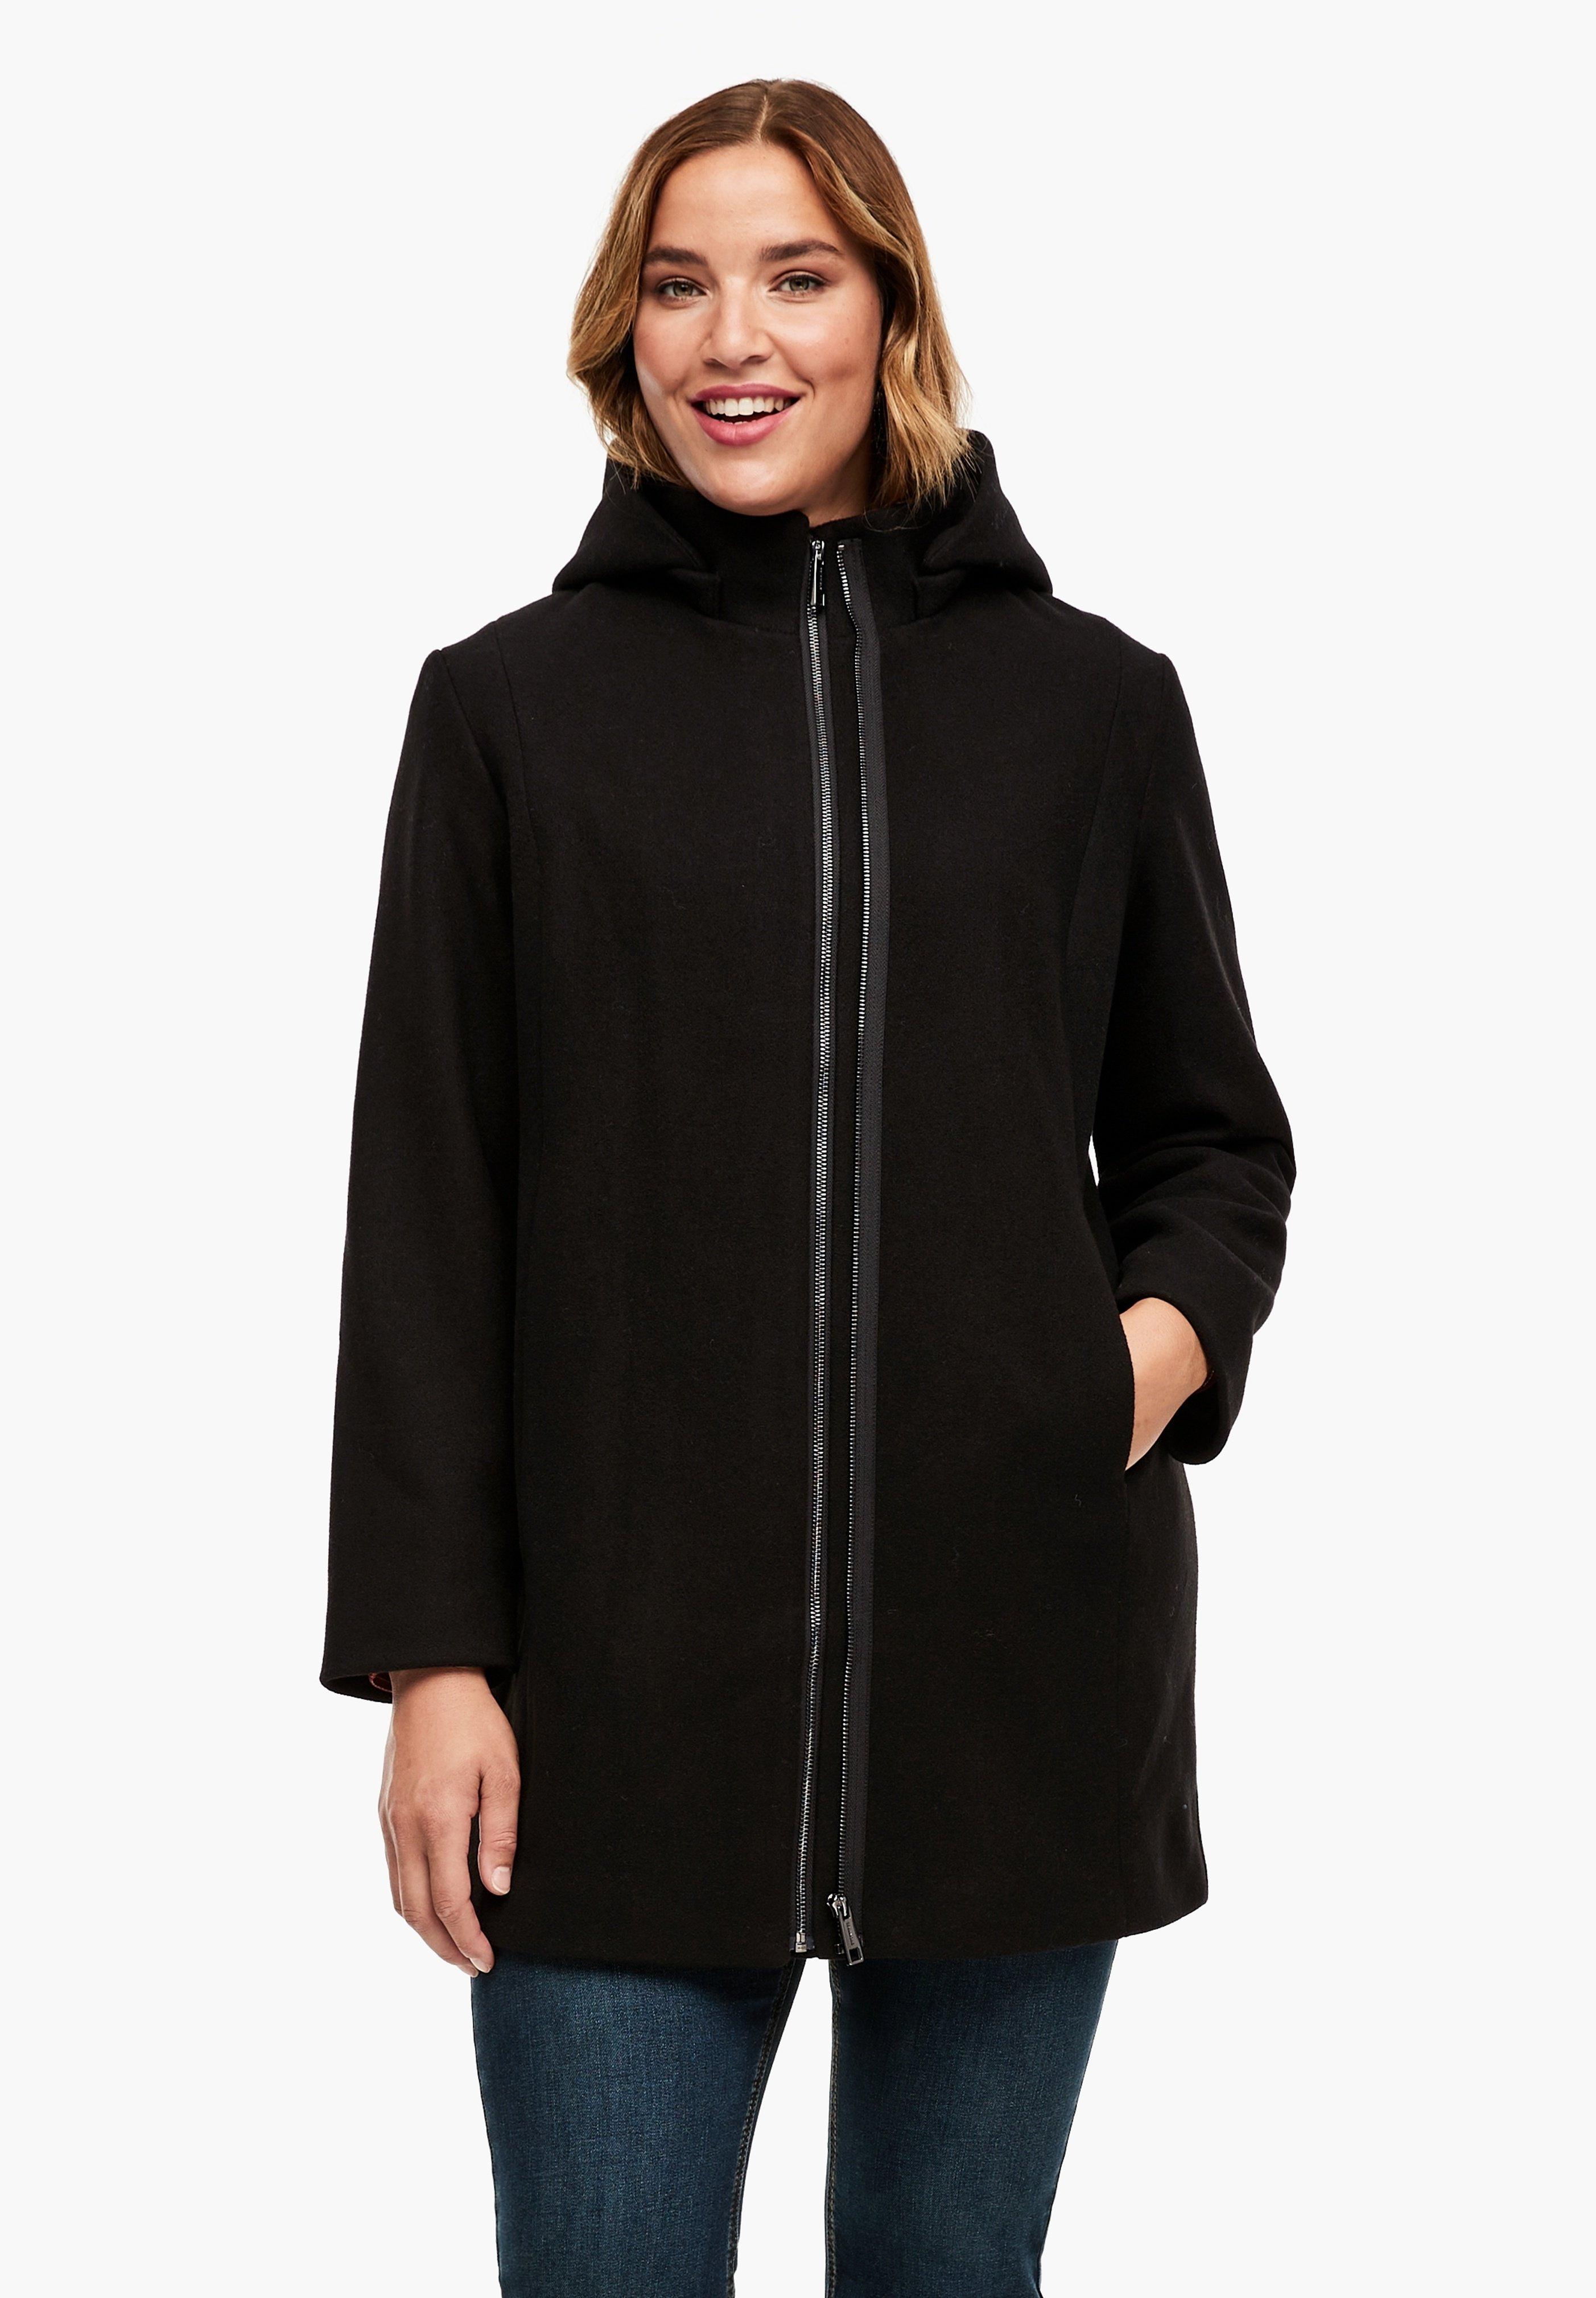 Damen MIT REISSVERSCHLUSS-DETAIL - Klassischer Mantel